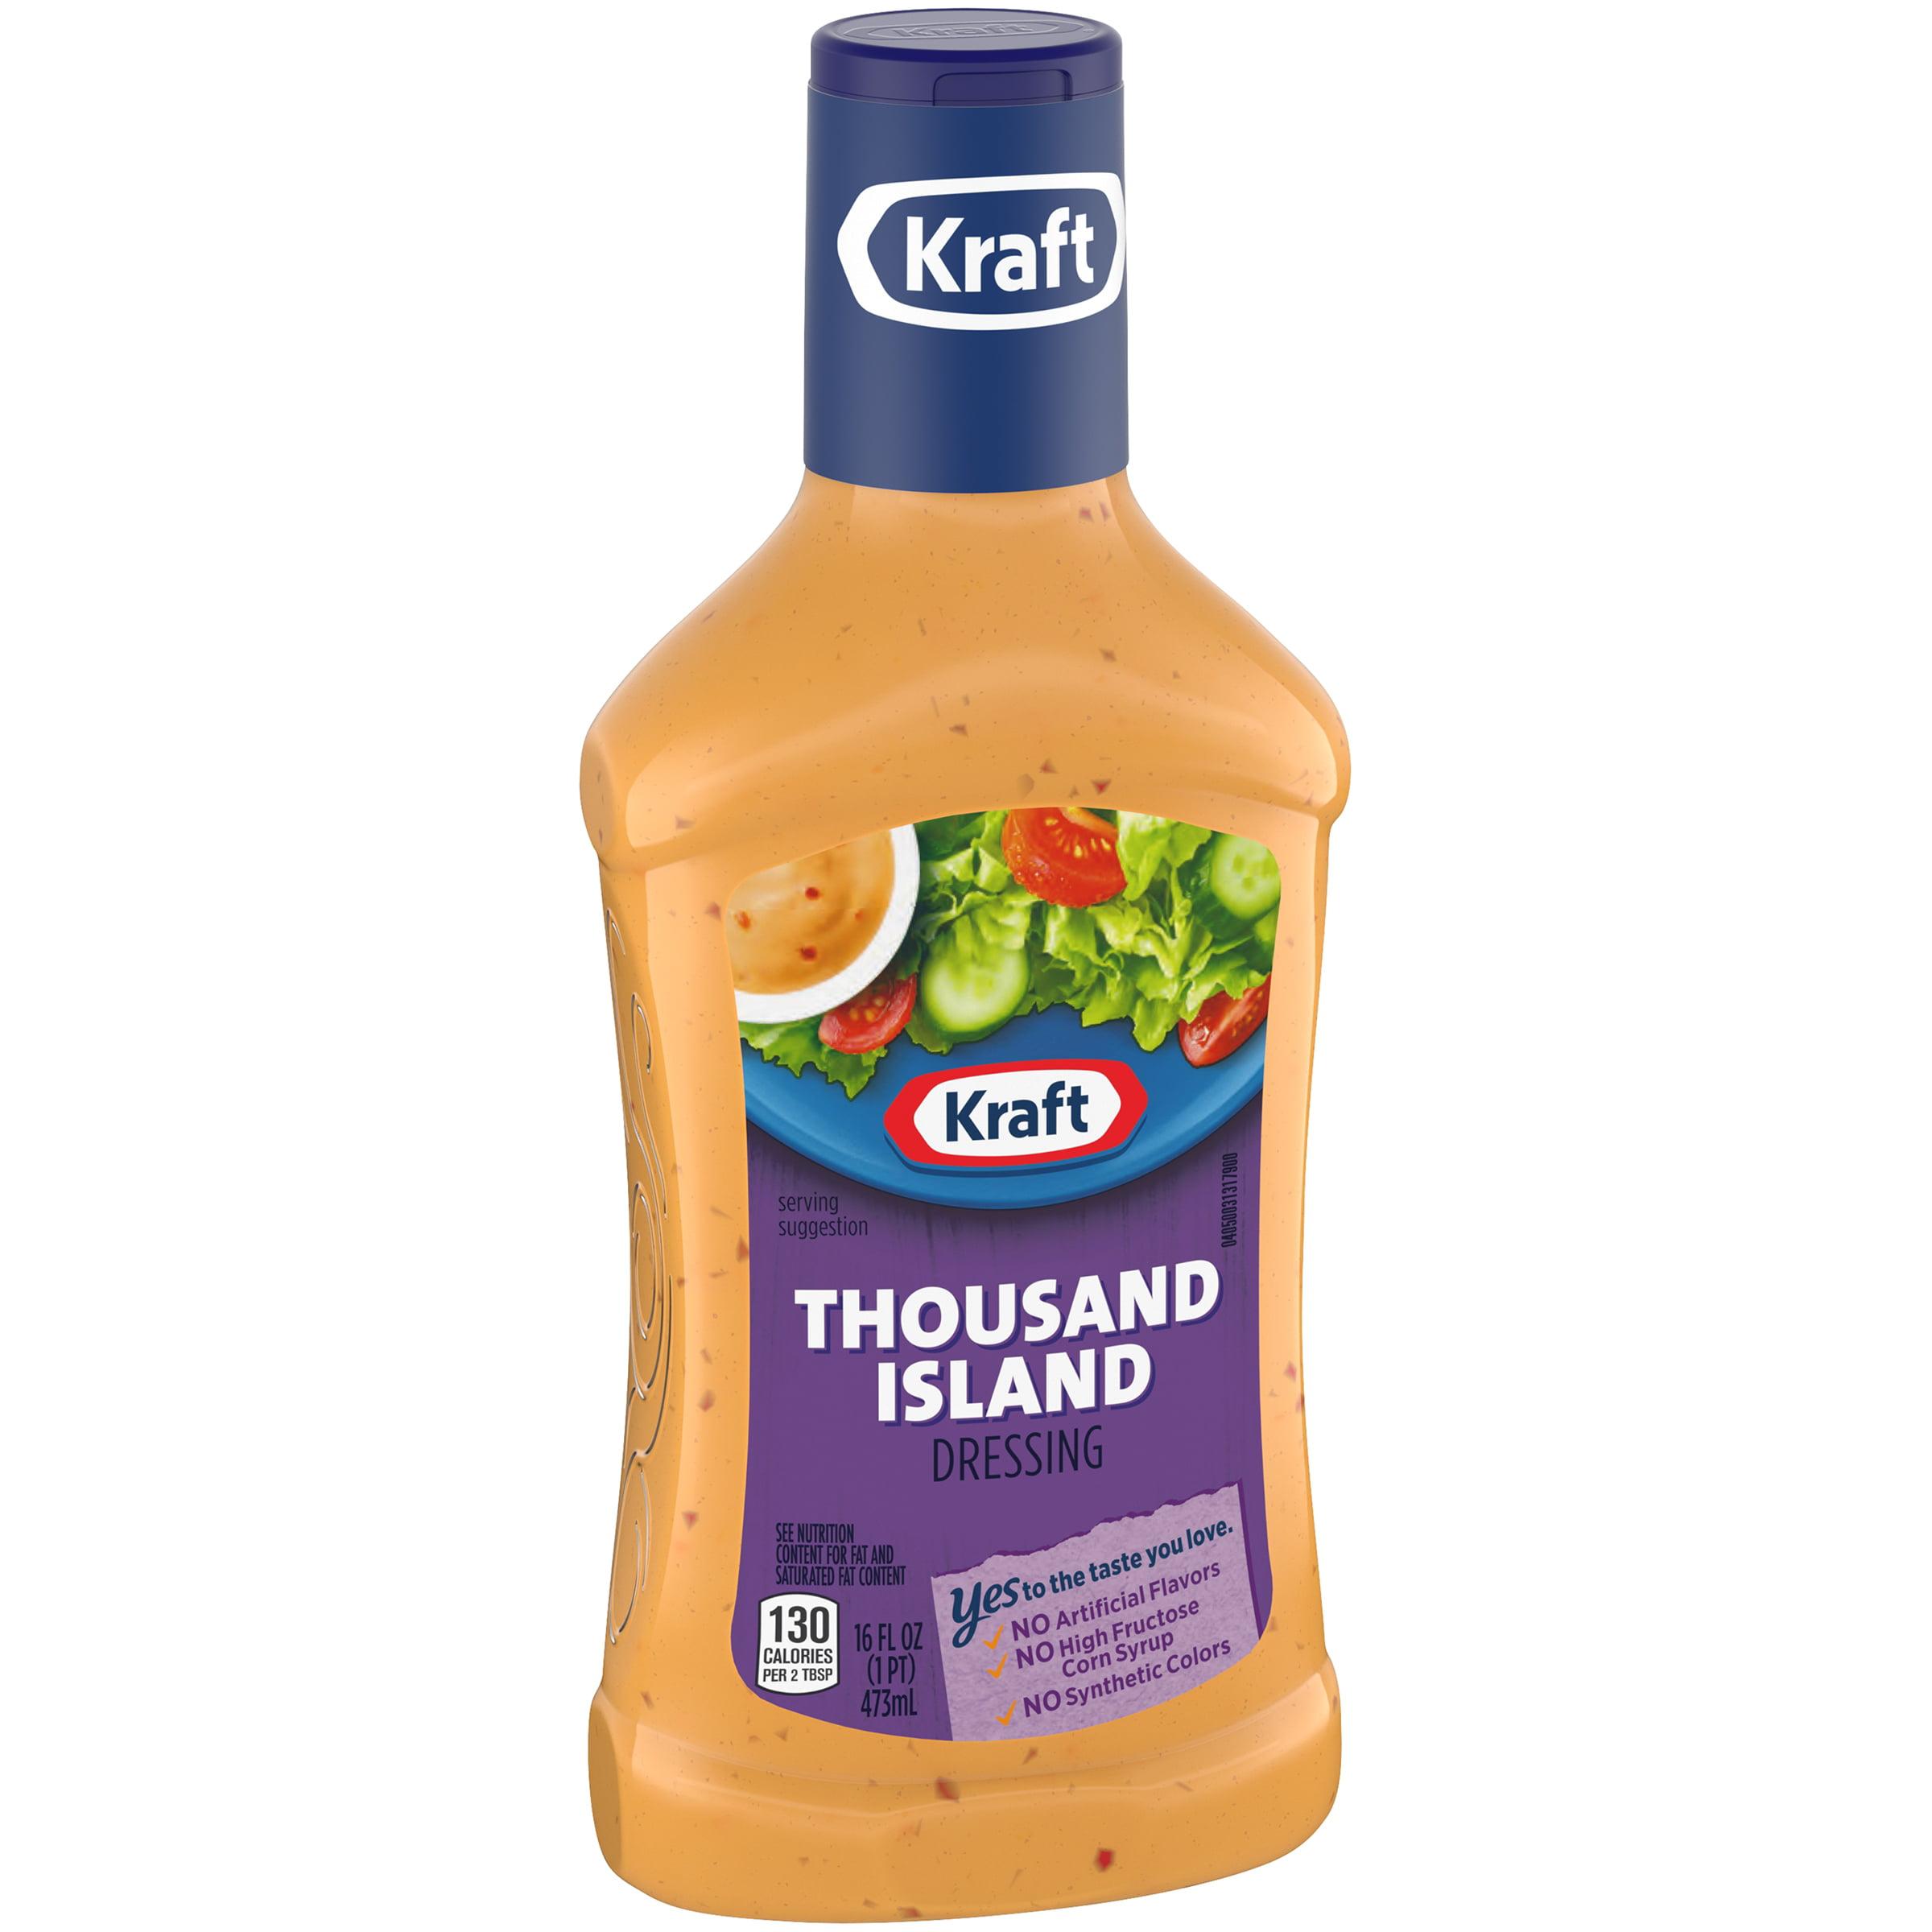 Kraft Thousand Island Dressing 16 Fl Oz Bottle Walmartcom